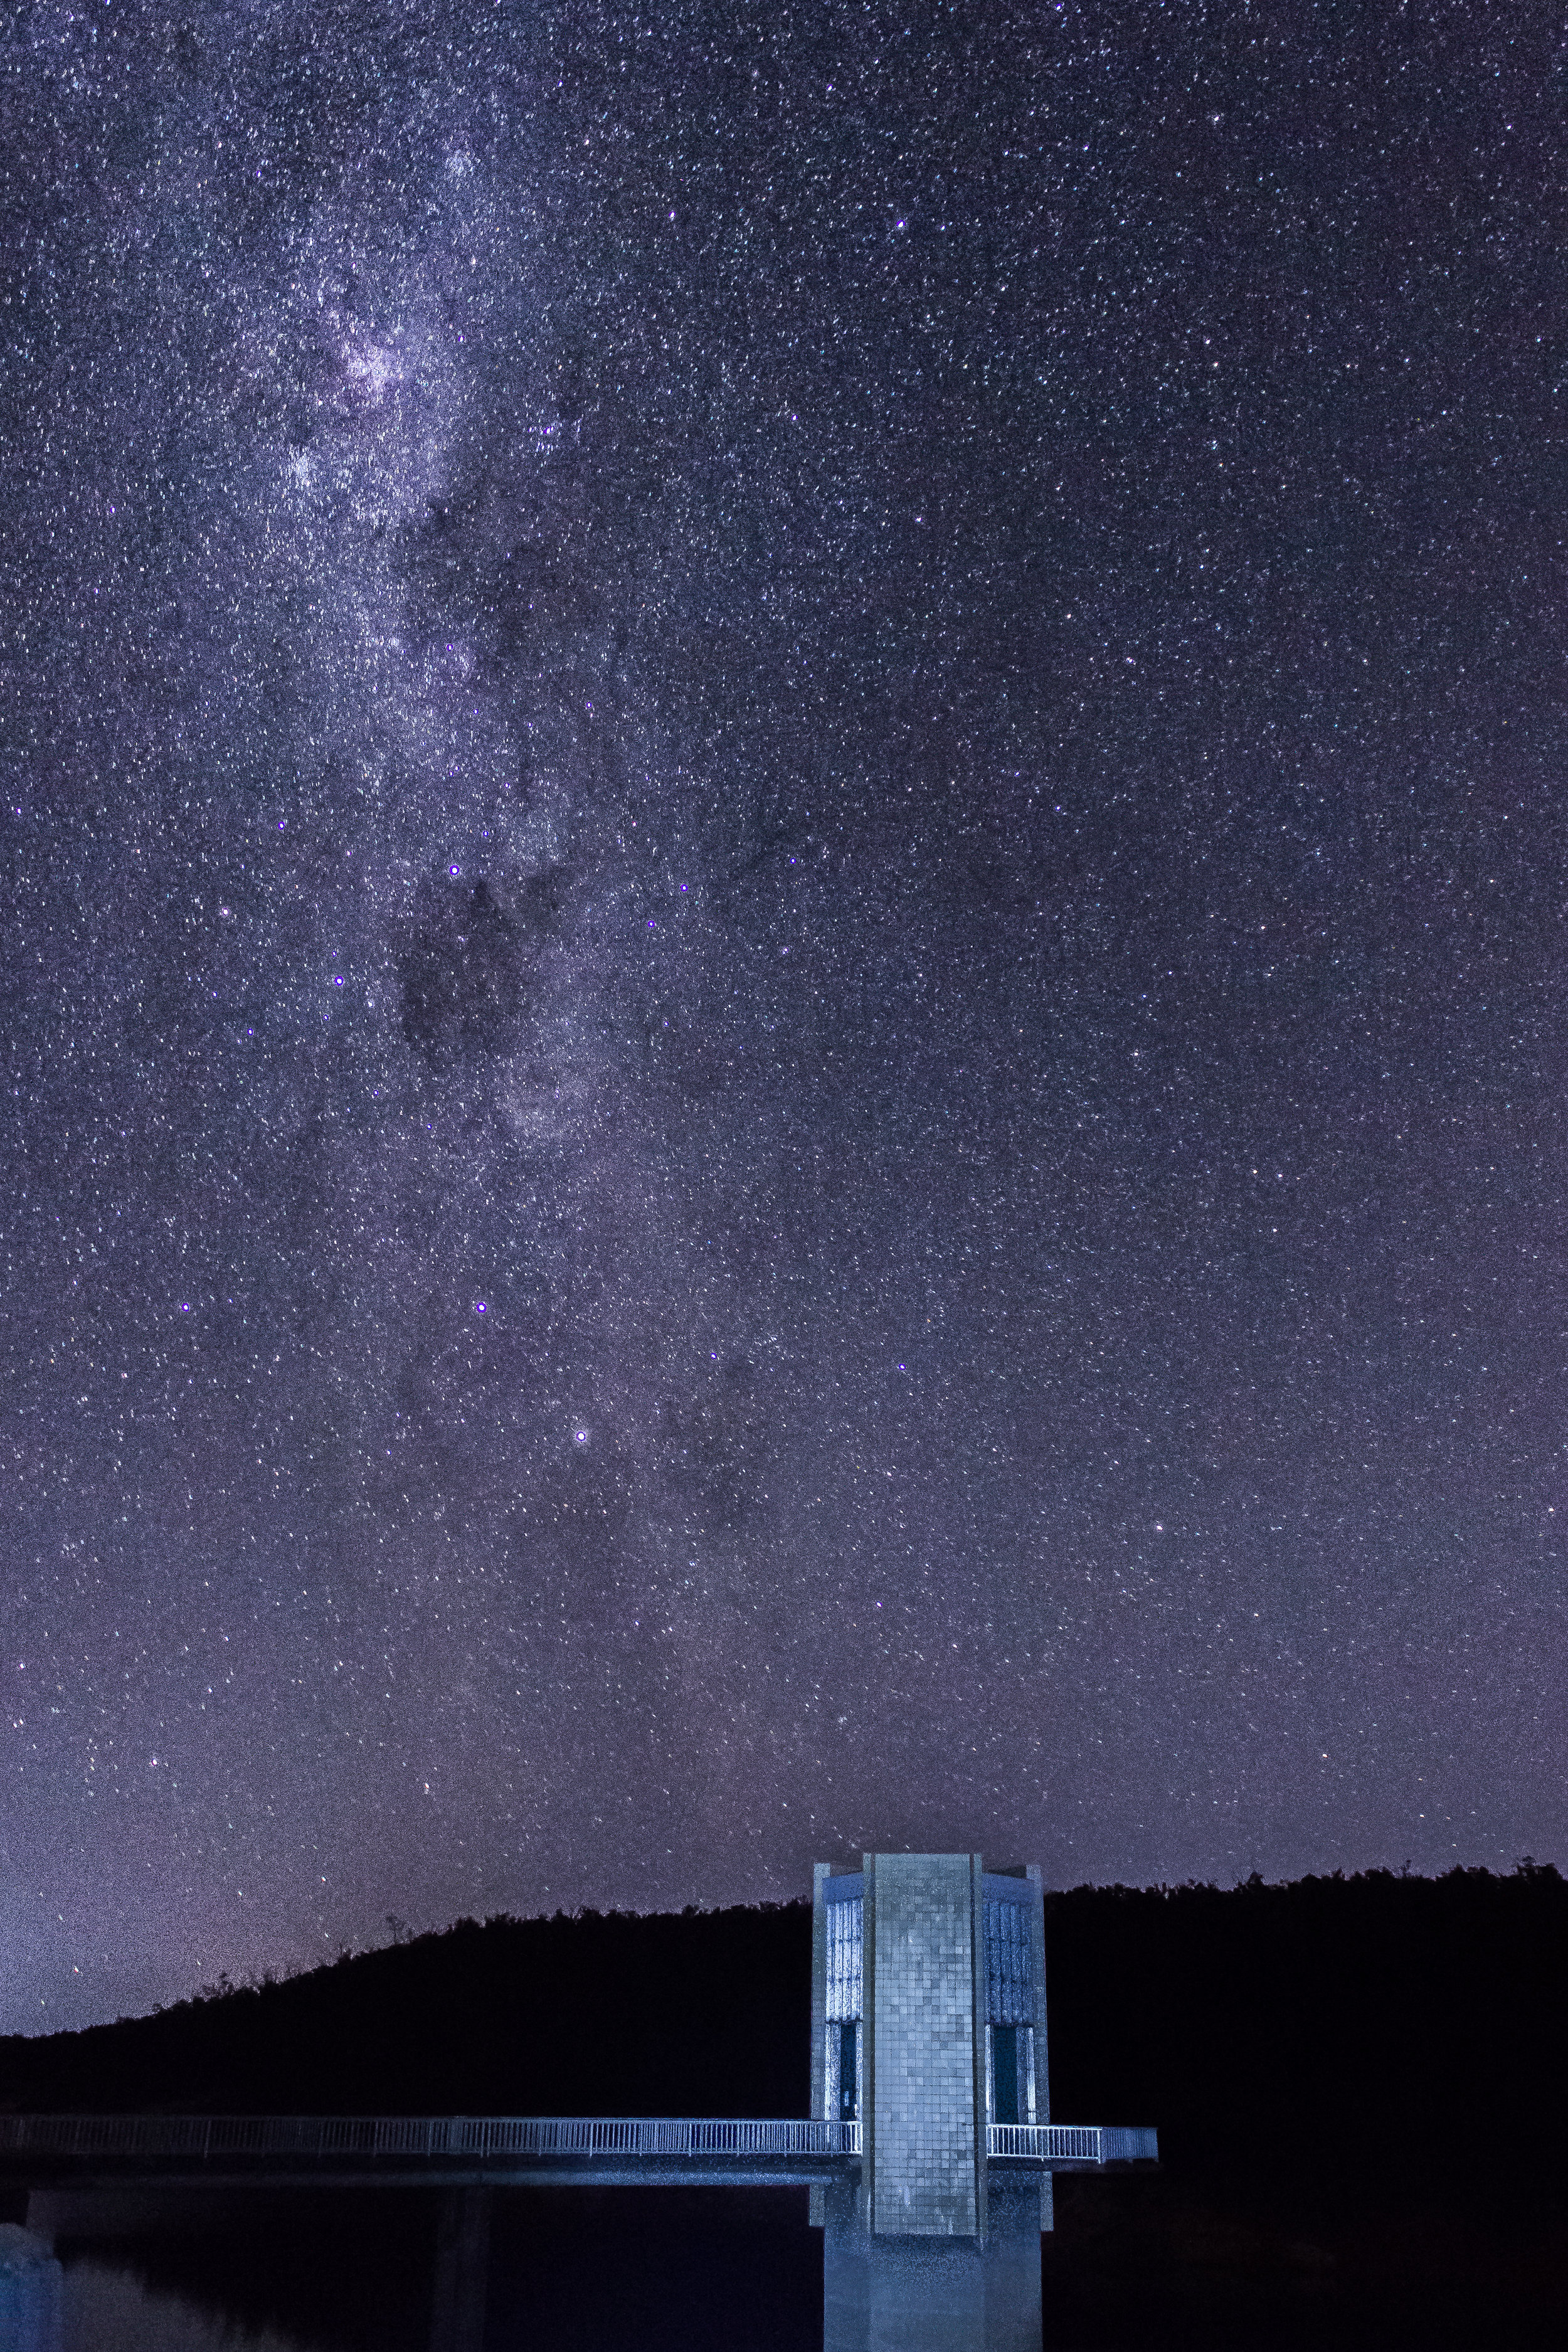 The Serpentine Dam pump house in Western Australia